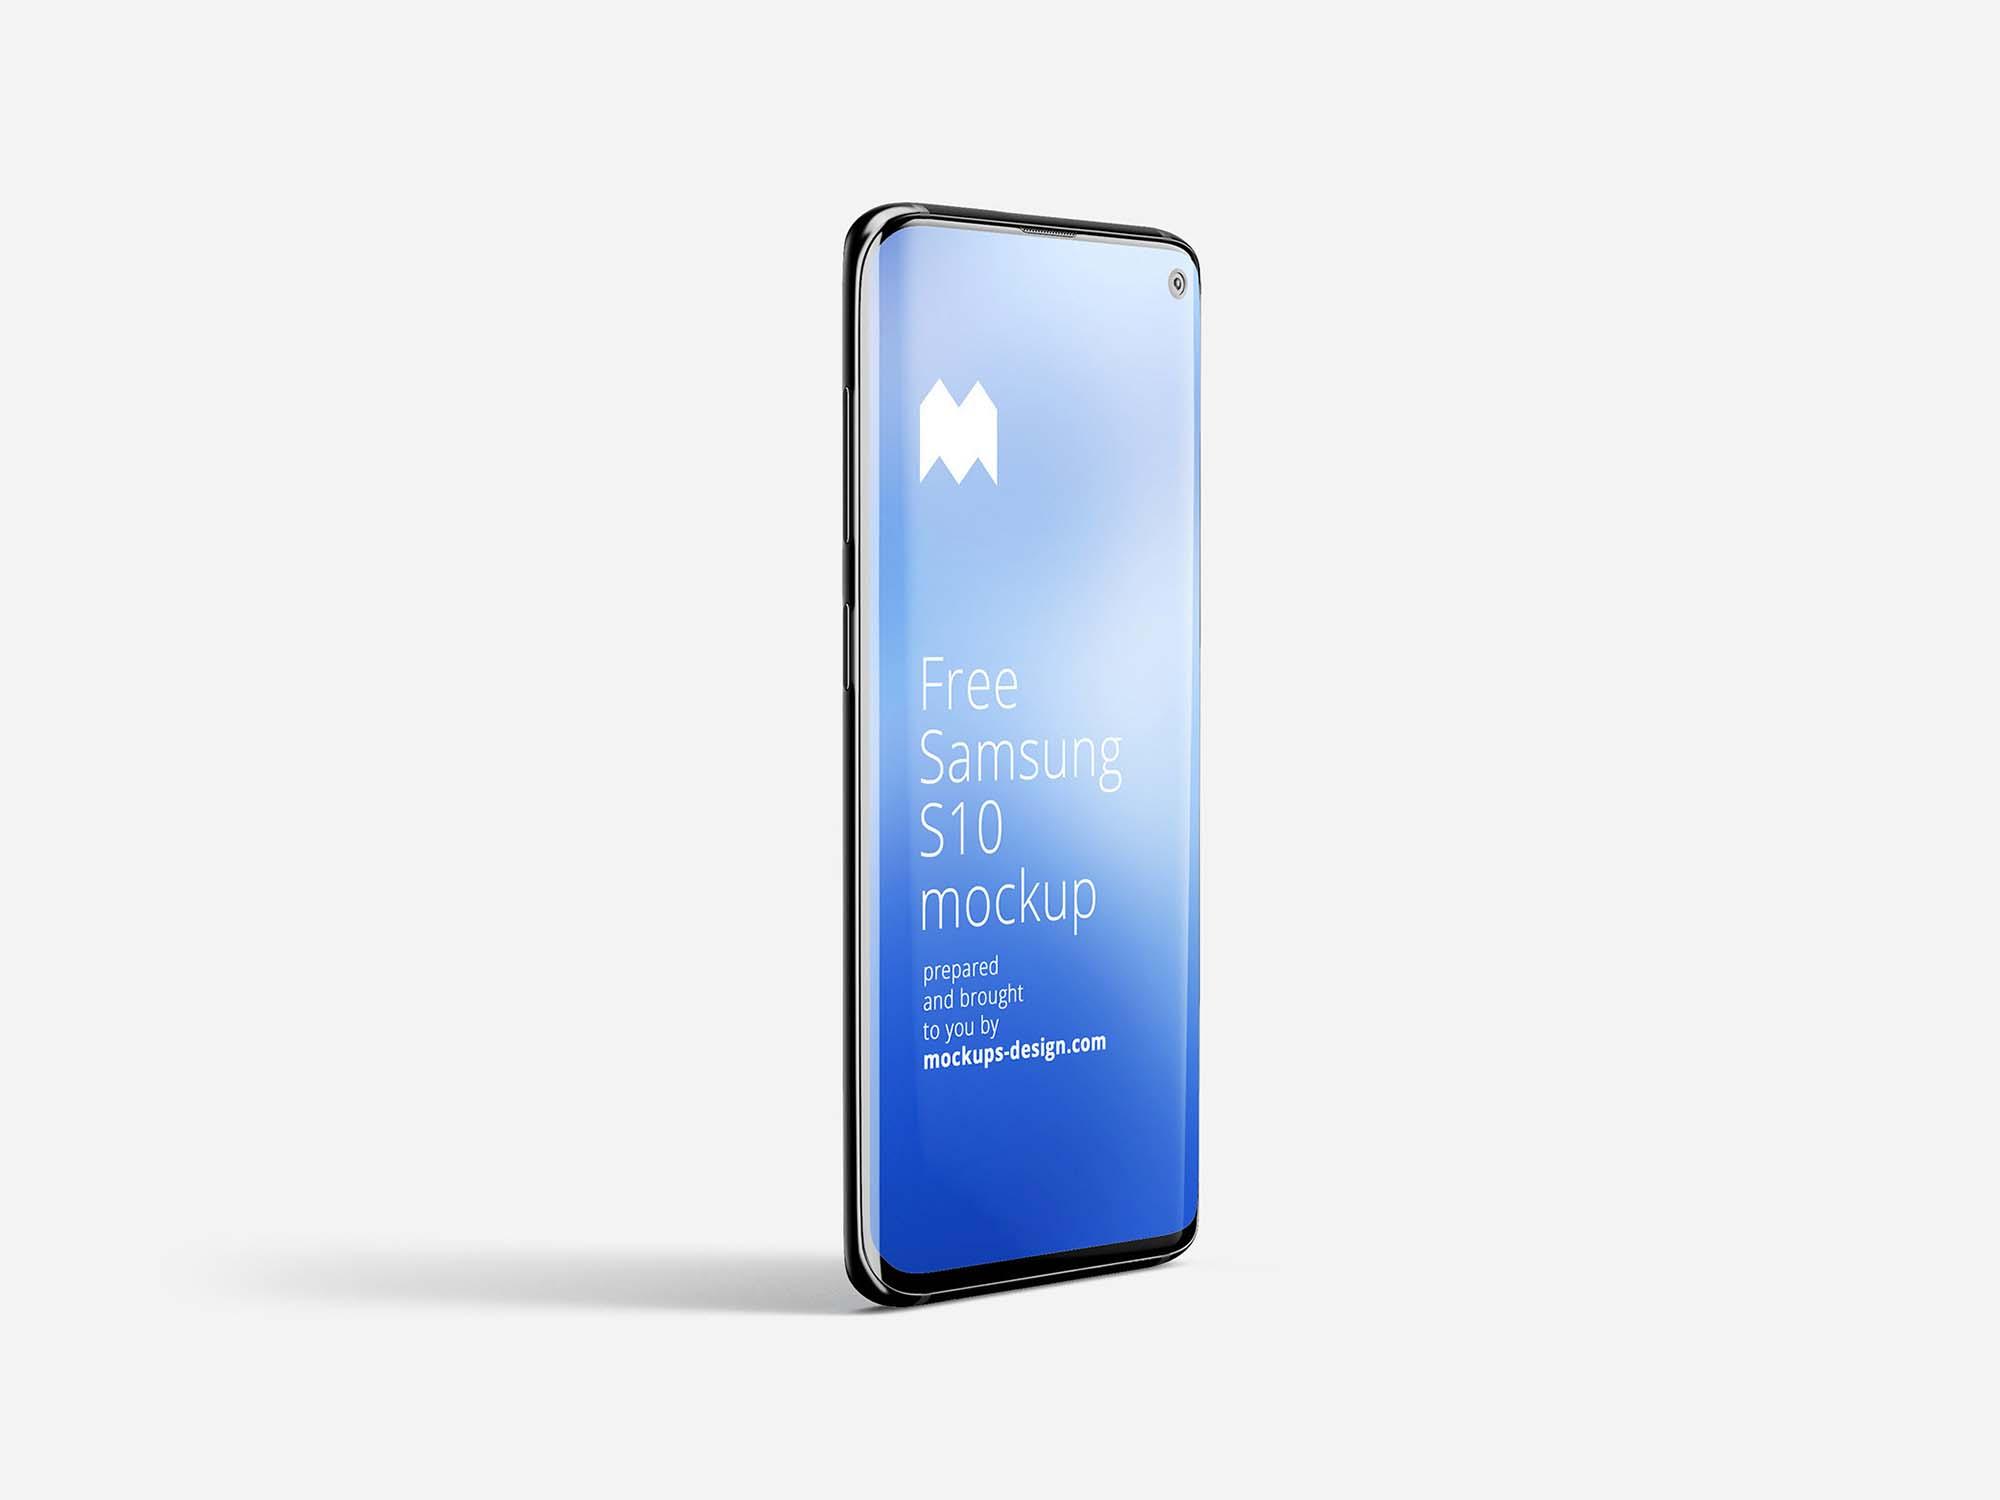 Samsung Galaxy S10 mockup 1